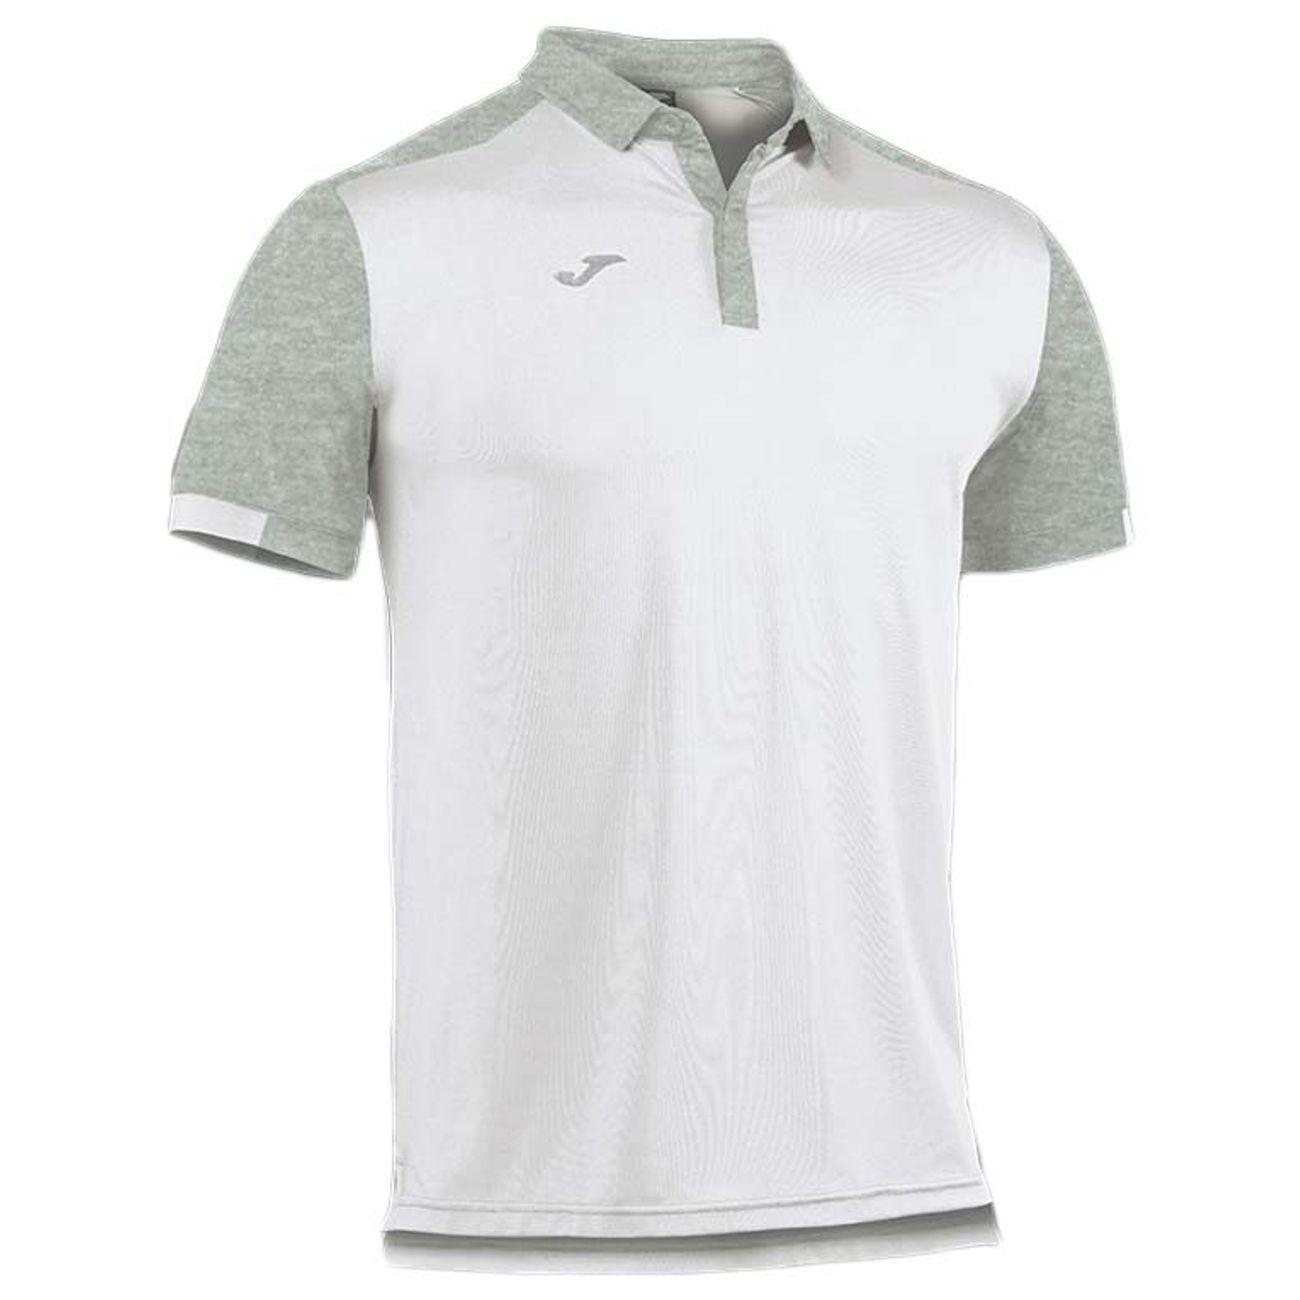 Tennis homme JOMA Joma Polo Comfort S/s